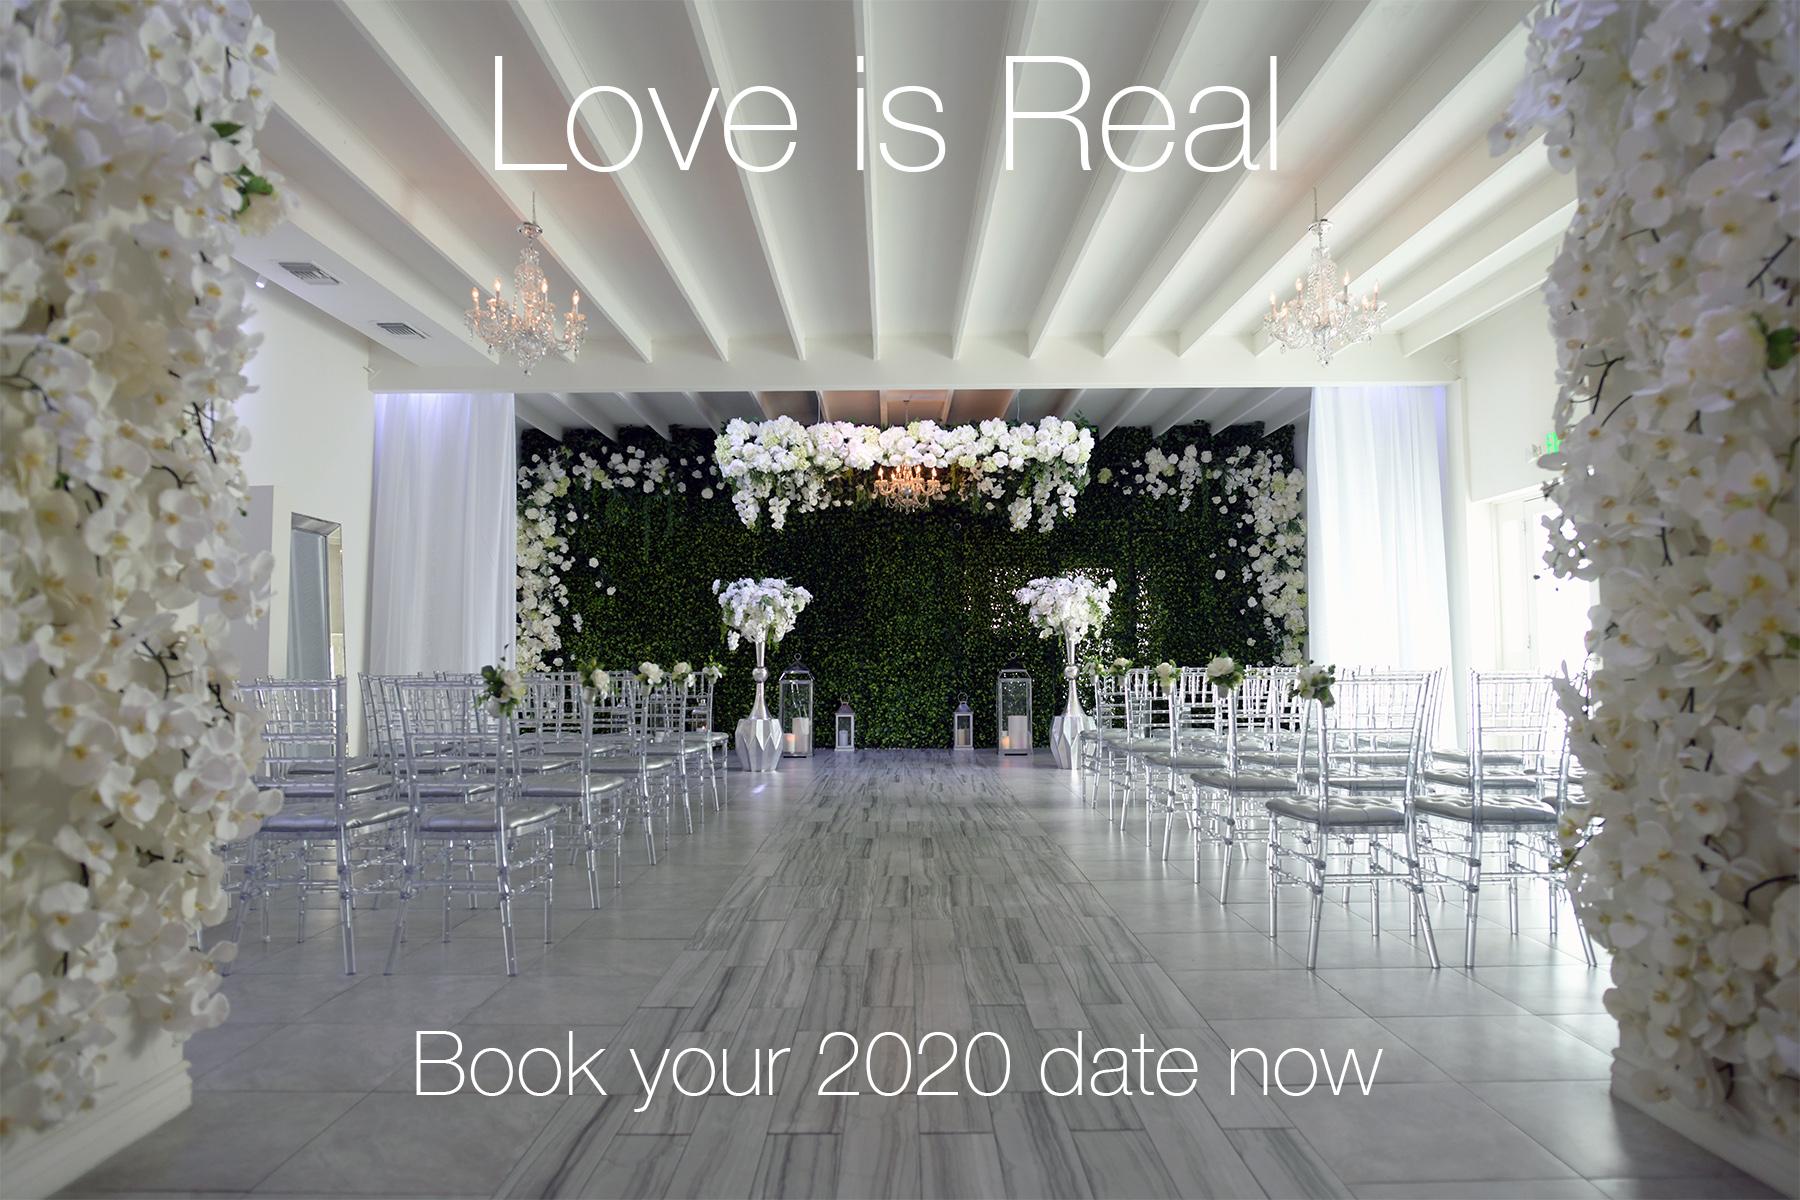 Albertson Wedding Chapel interior image 2020